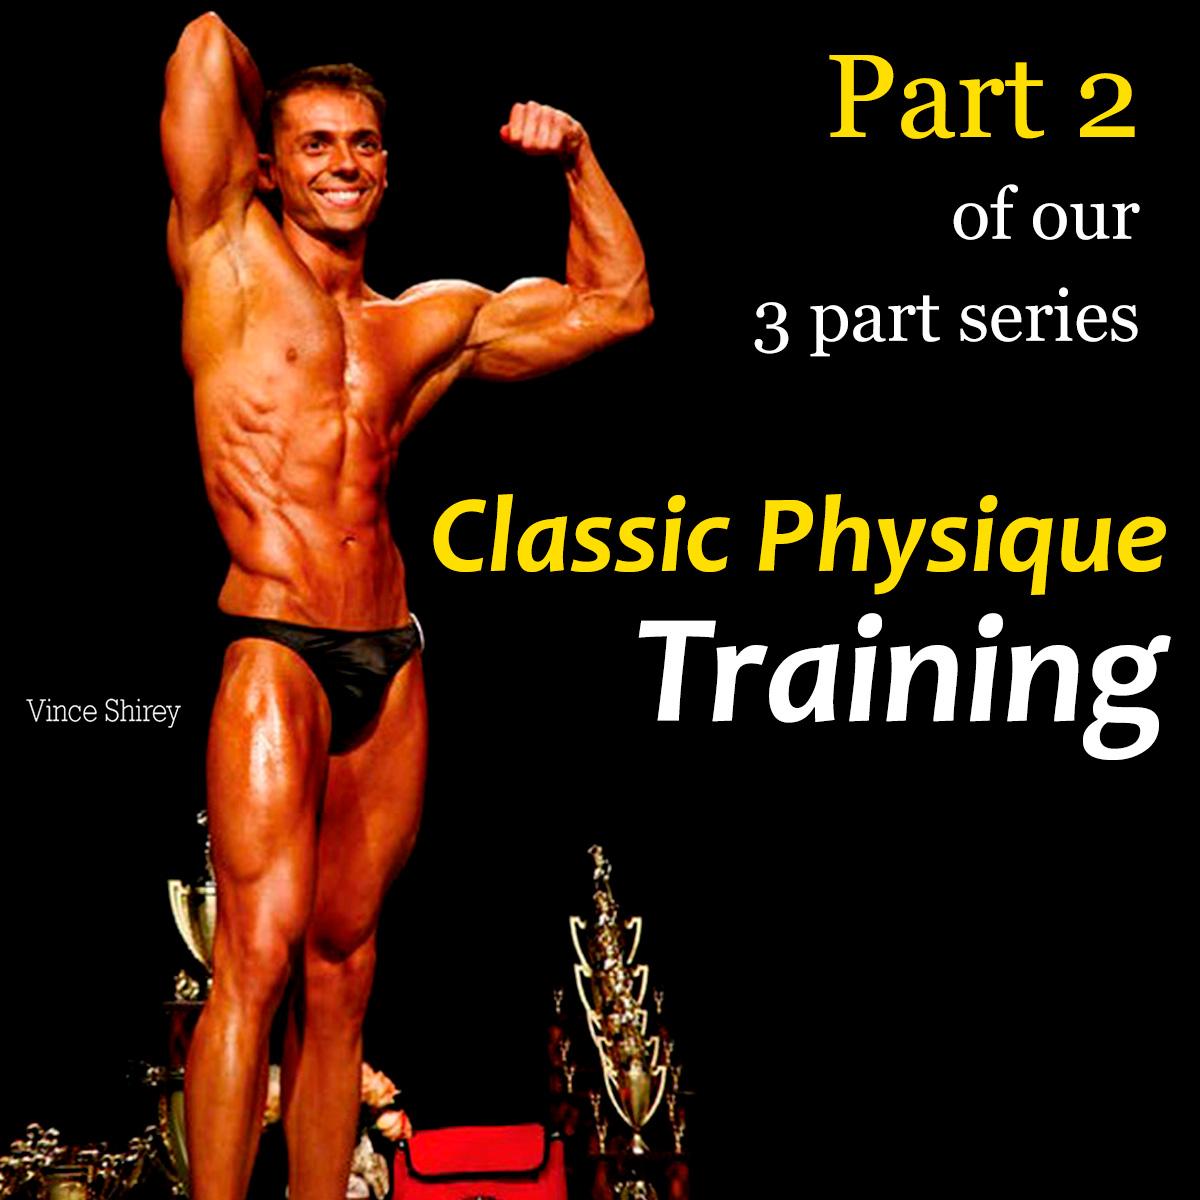 Classic Physique - Training